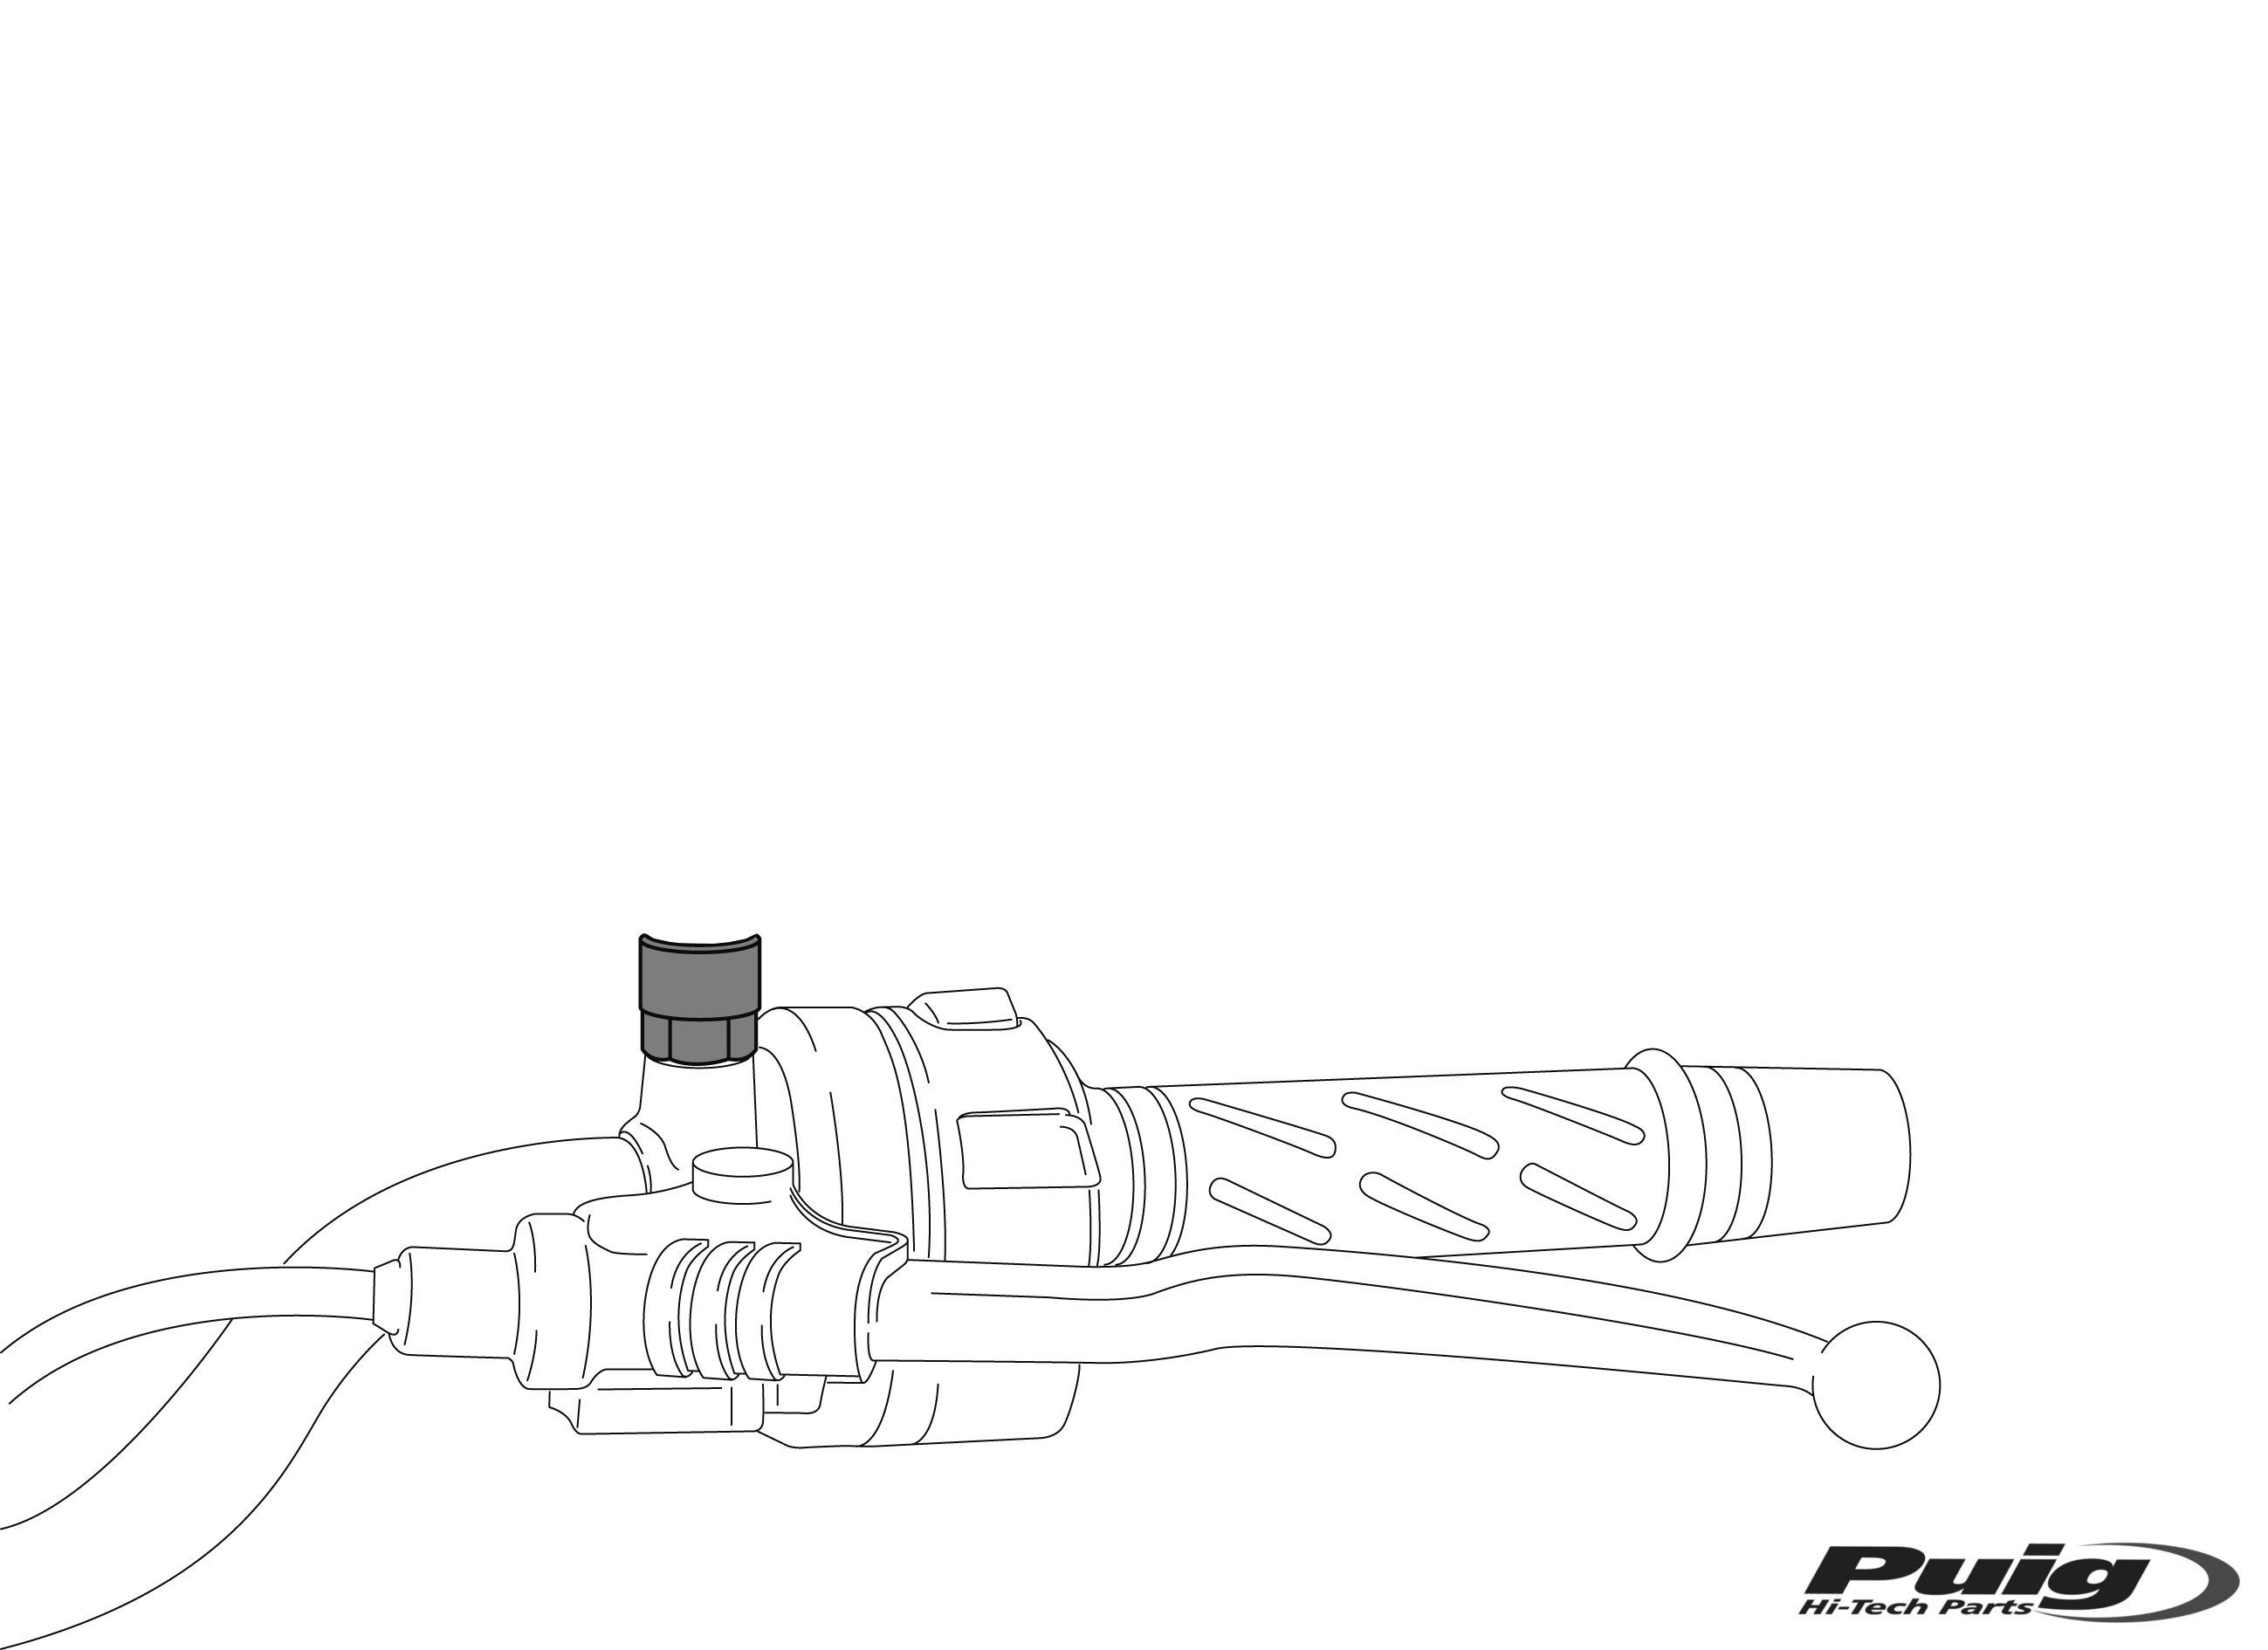 Adaptador retrovisor al carenado Puig 9586N lado derecho e izquierdo para Yamaha R3 15-17